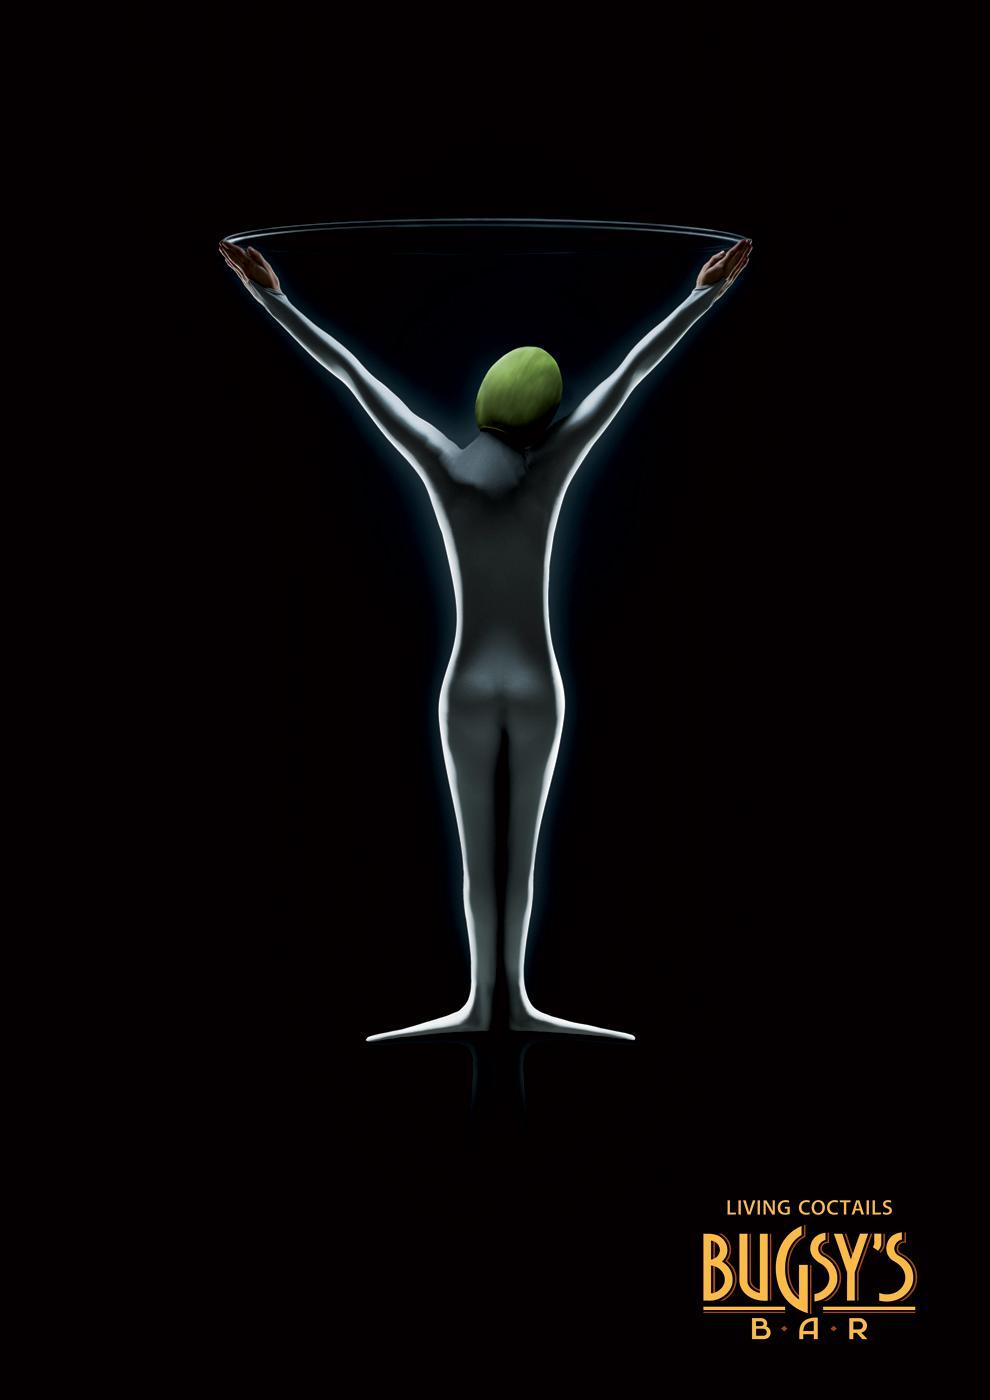 Bugsy's Bar Print Ad -  Glass, 2